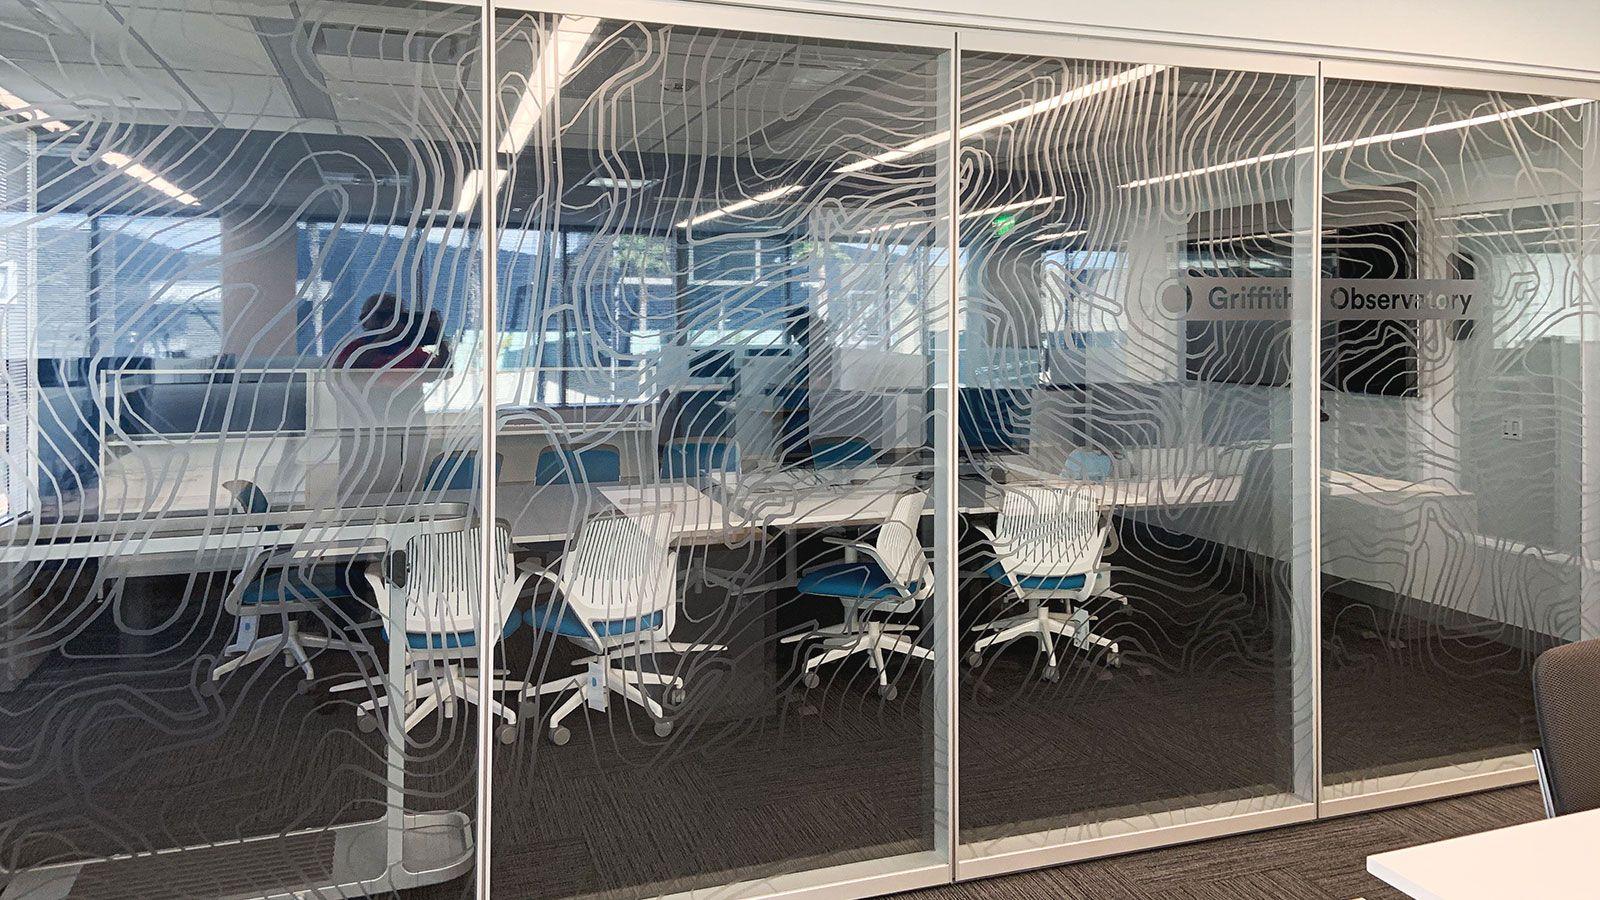 Neutrogena decorative window decals